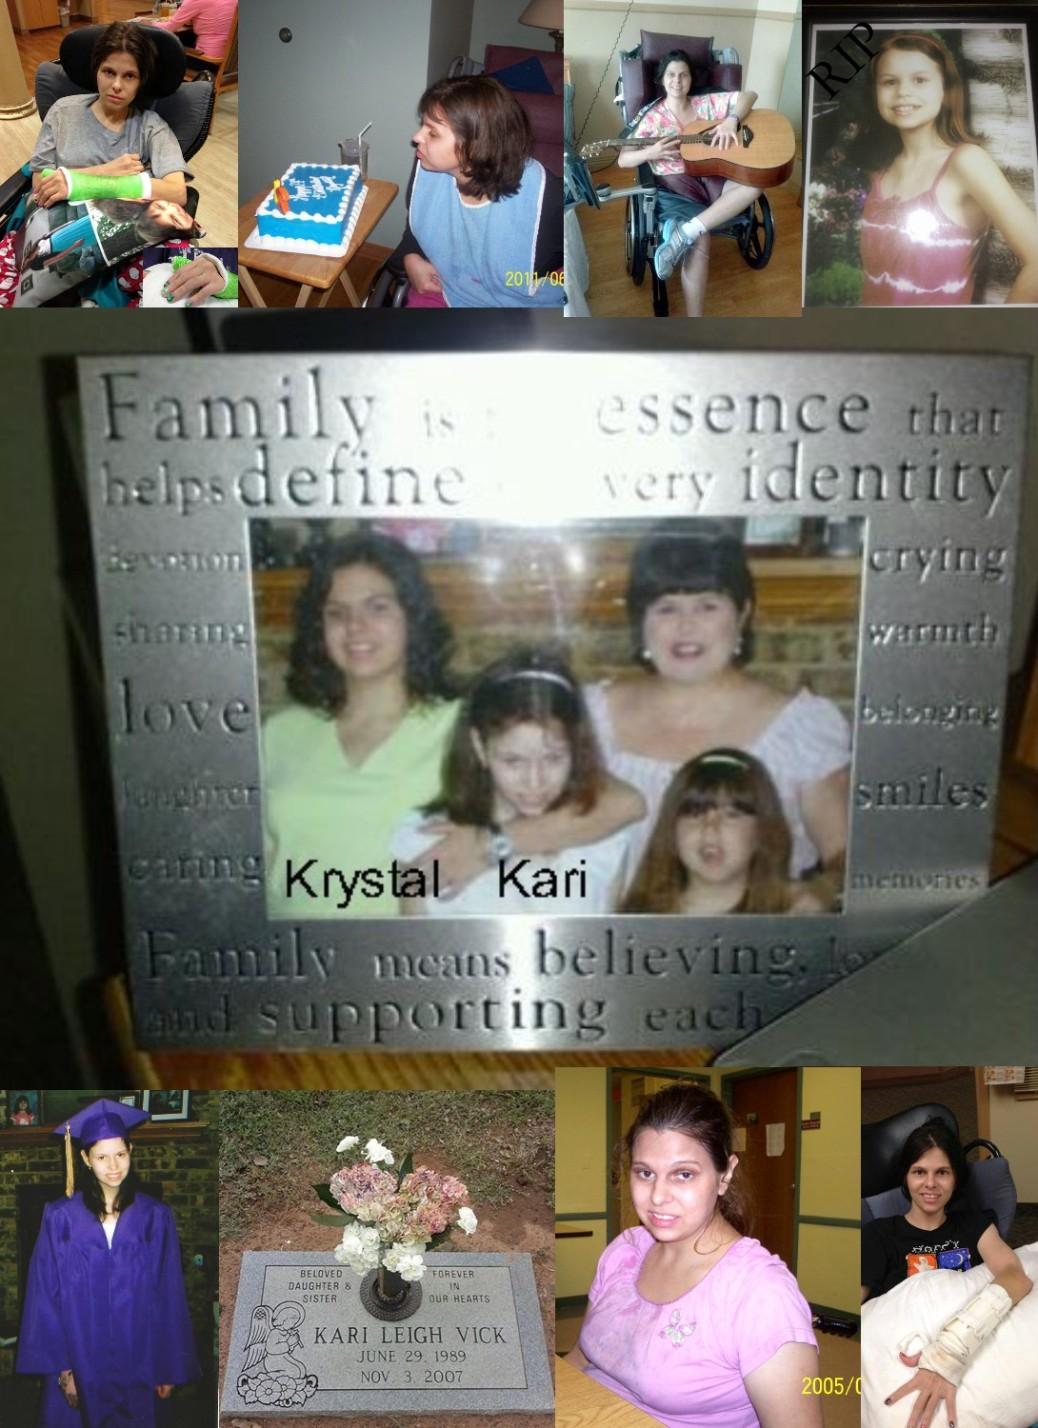 Krystal and Kari